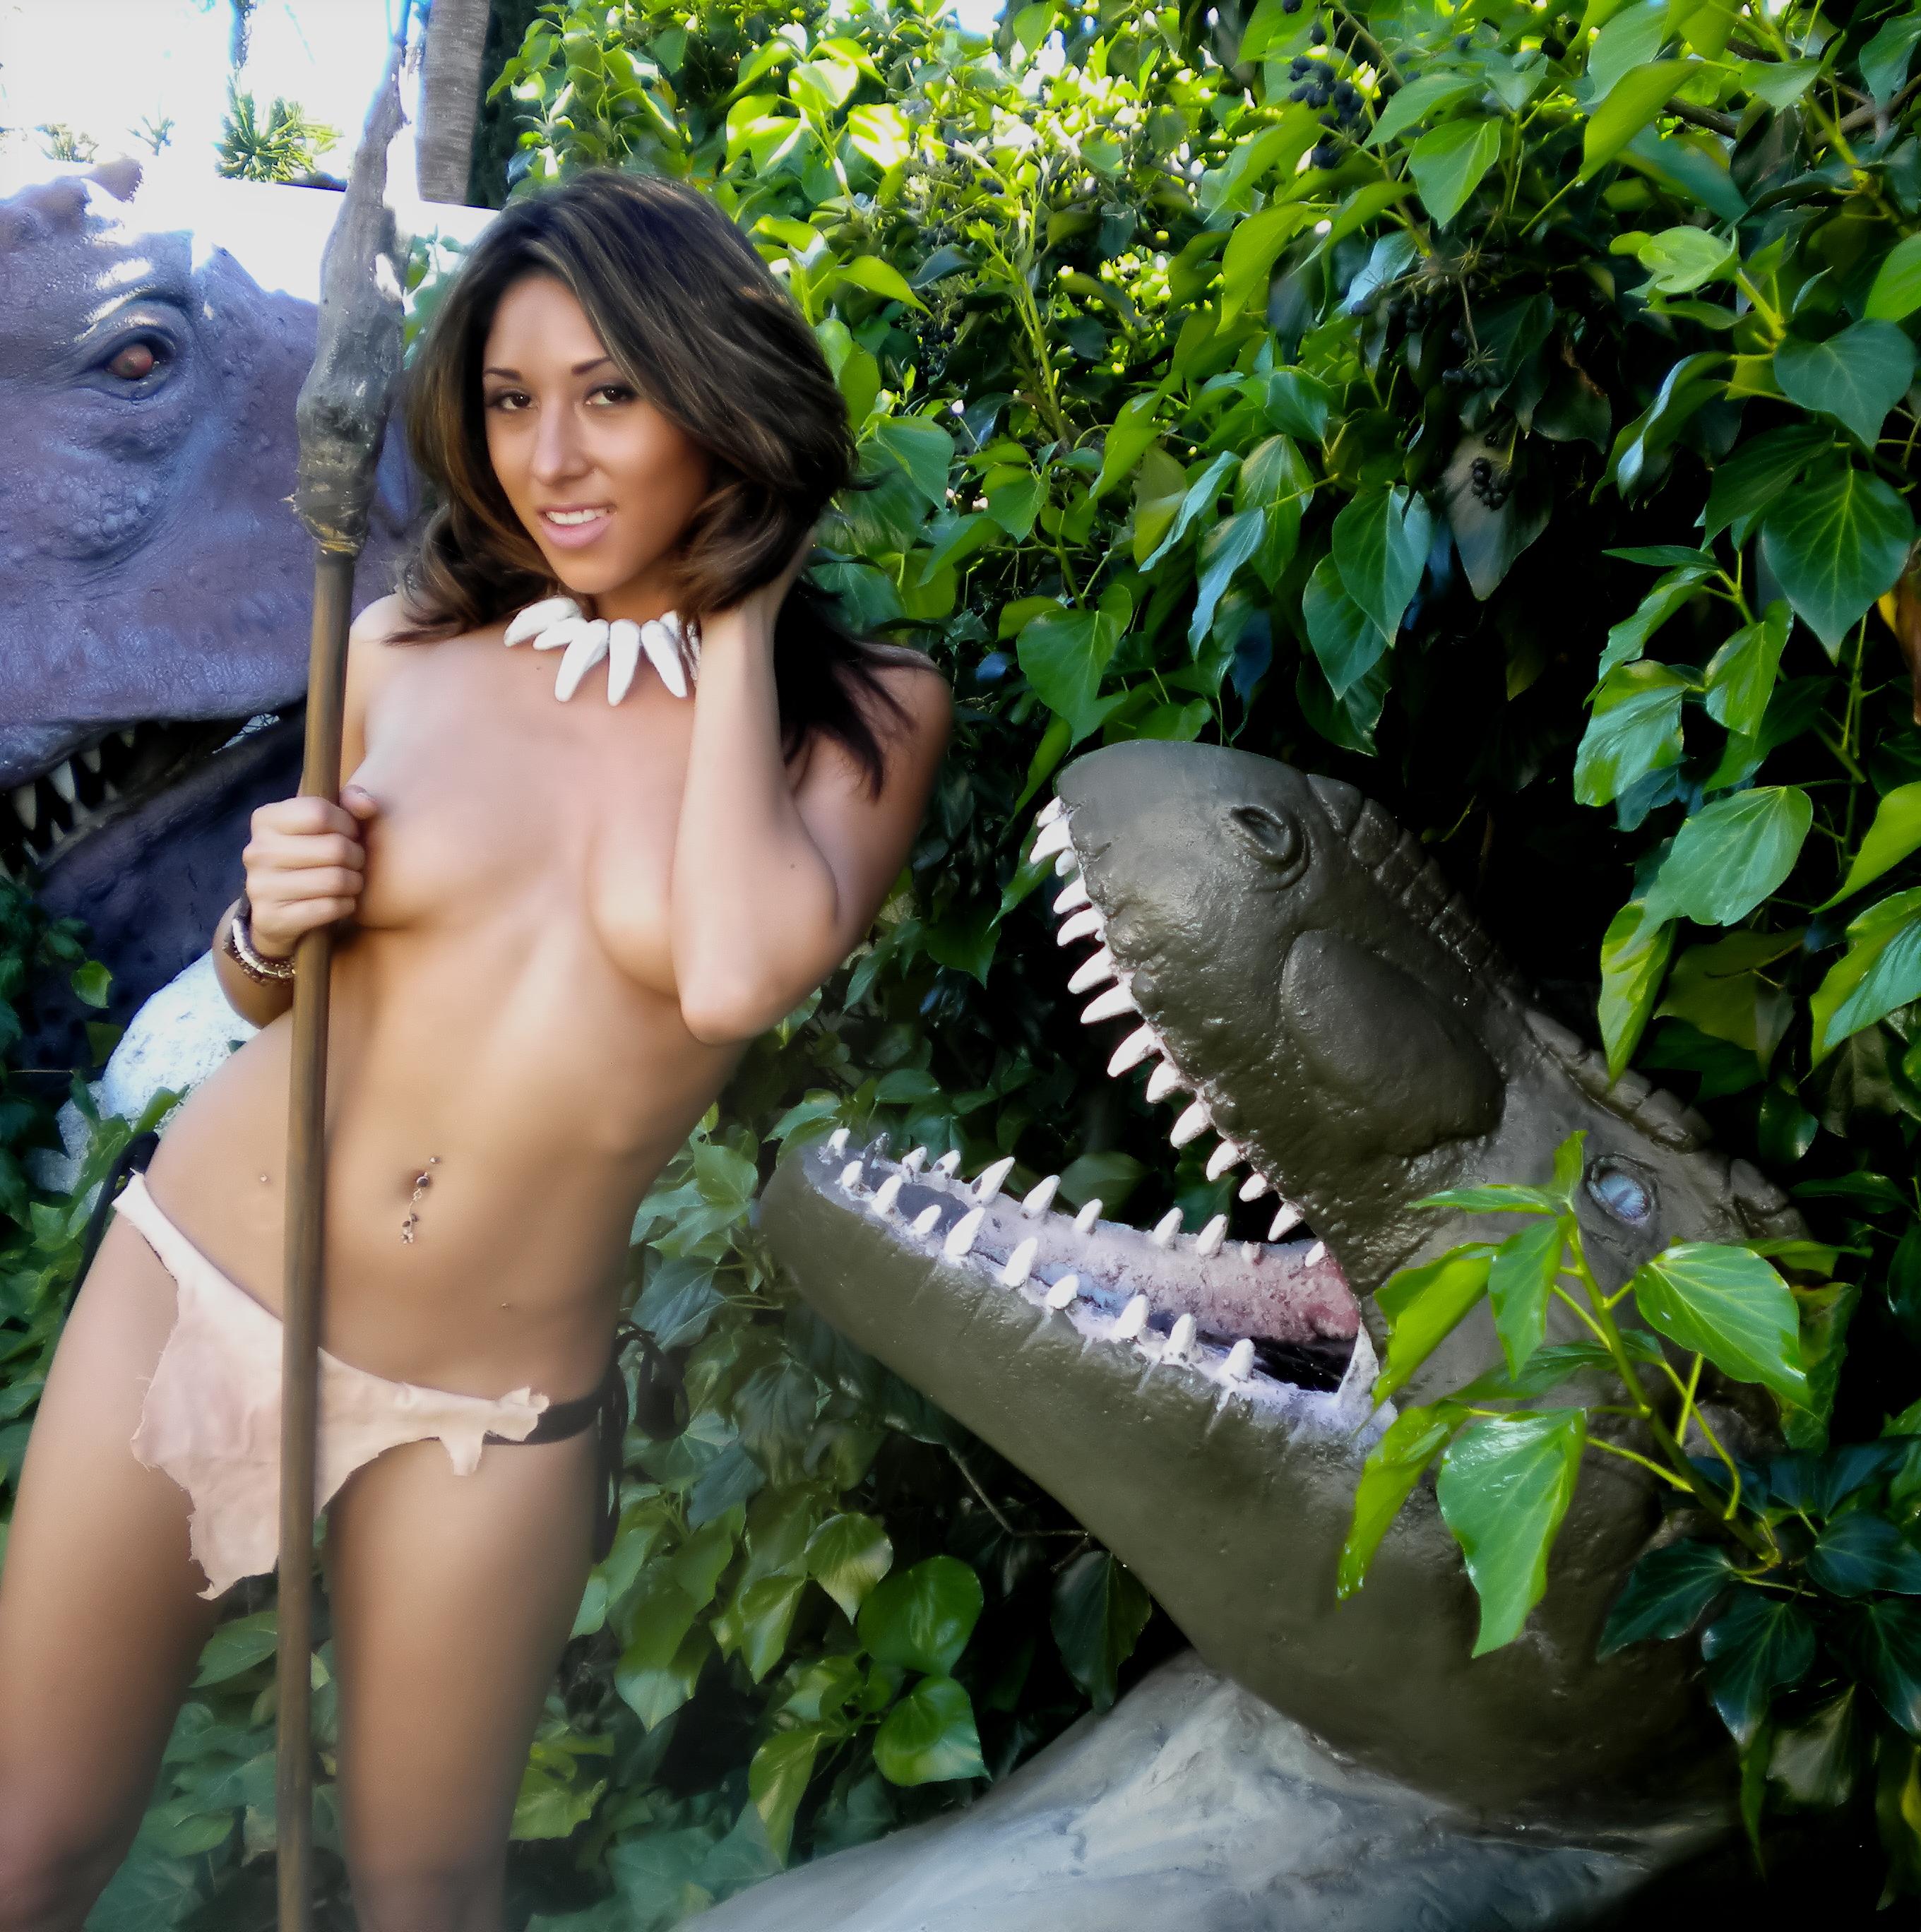 http://donglutsdinosaurs.com/wp-content/uploads/2014/09/trophy-head.jpg